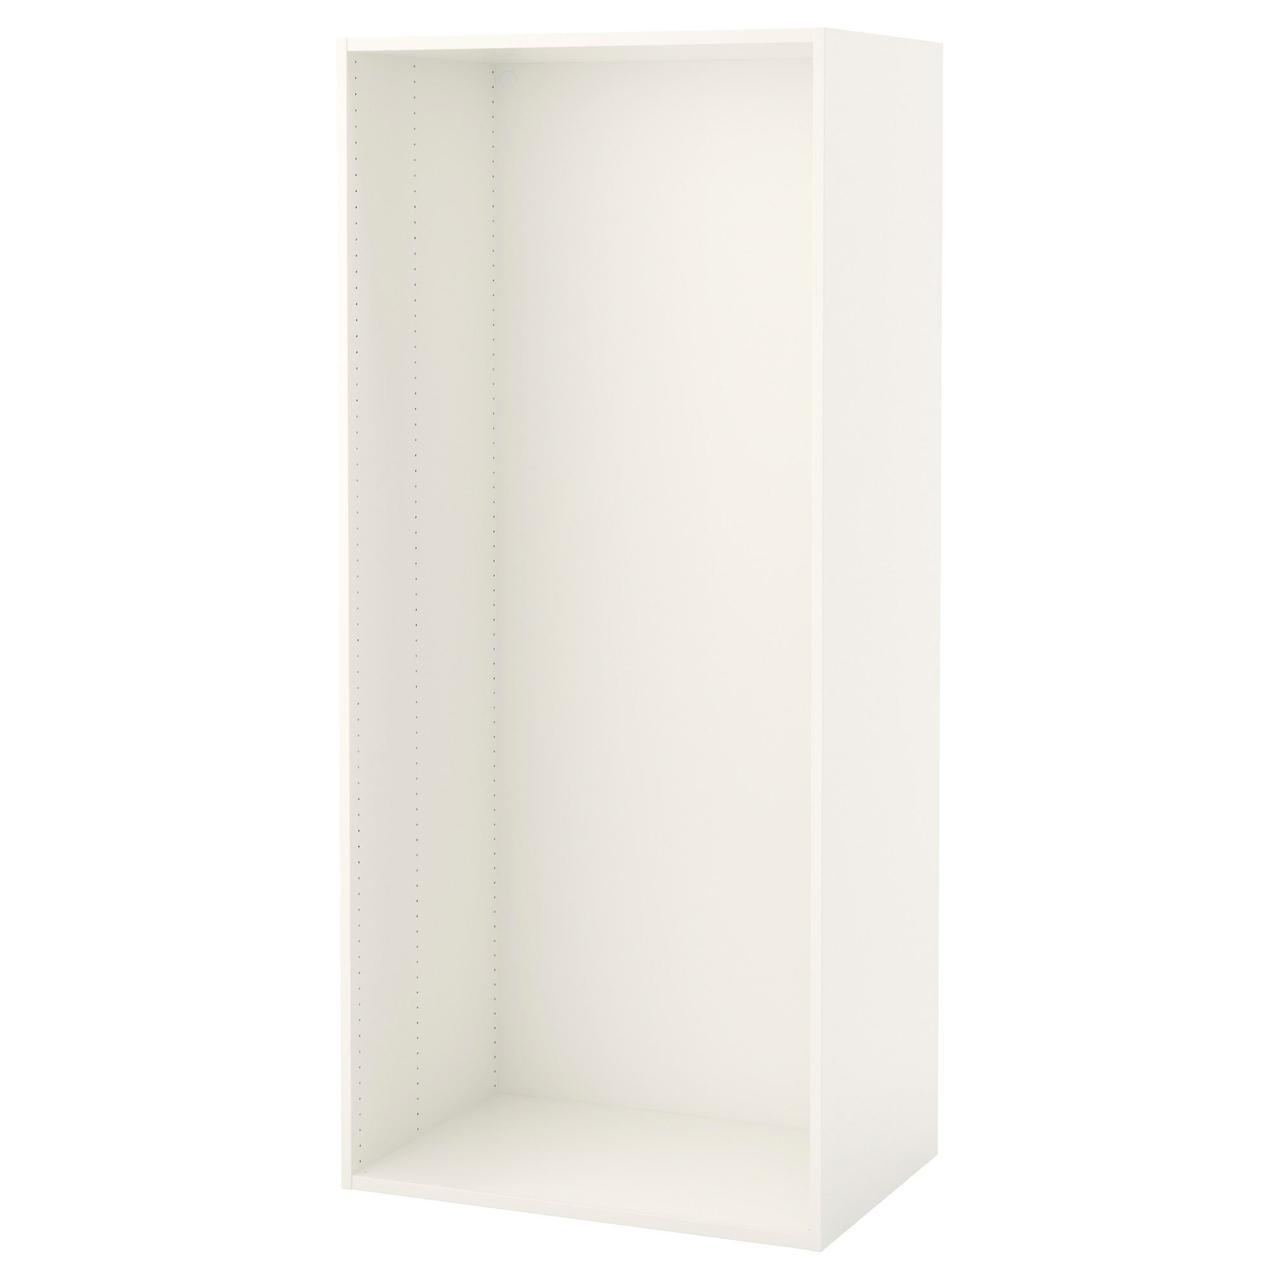 Каркас IKEA PLATSA 80x55x180 см белый 703.309.45